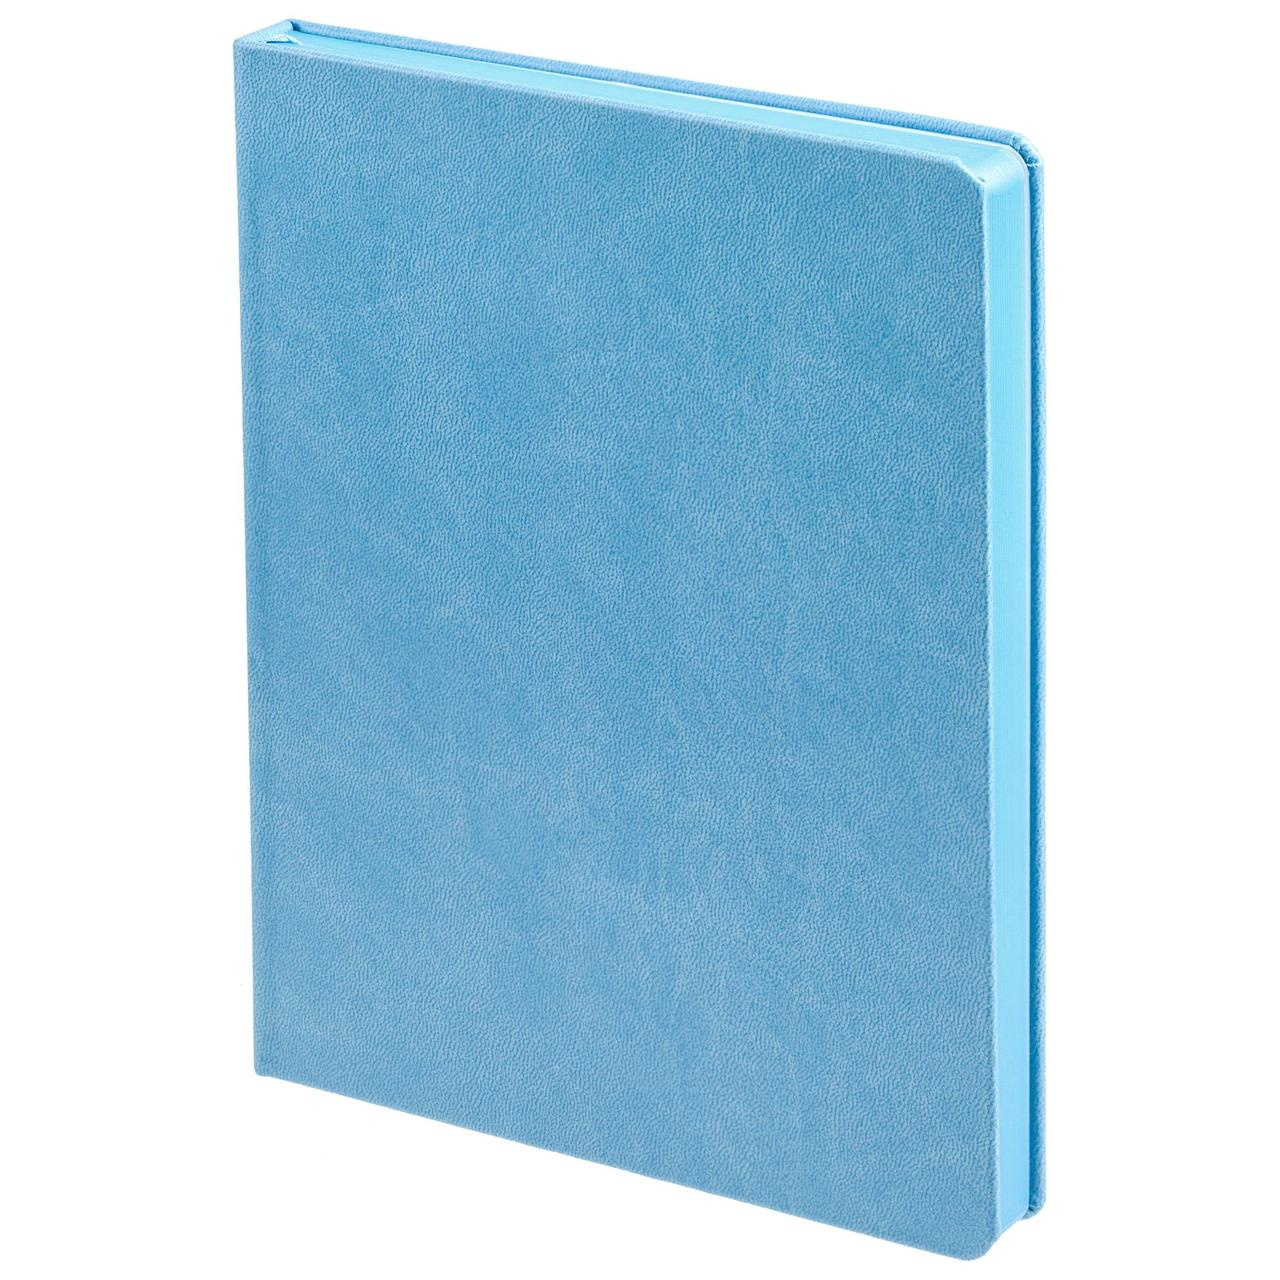 Ежедневник Brand Tone, недатированный, голубой (артикул 17882.14)